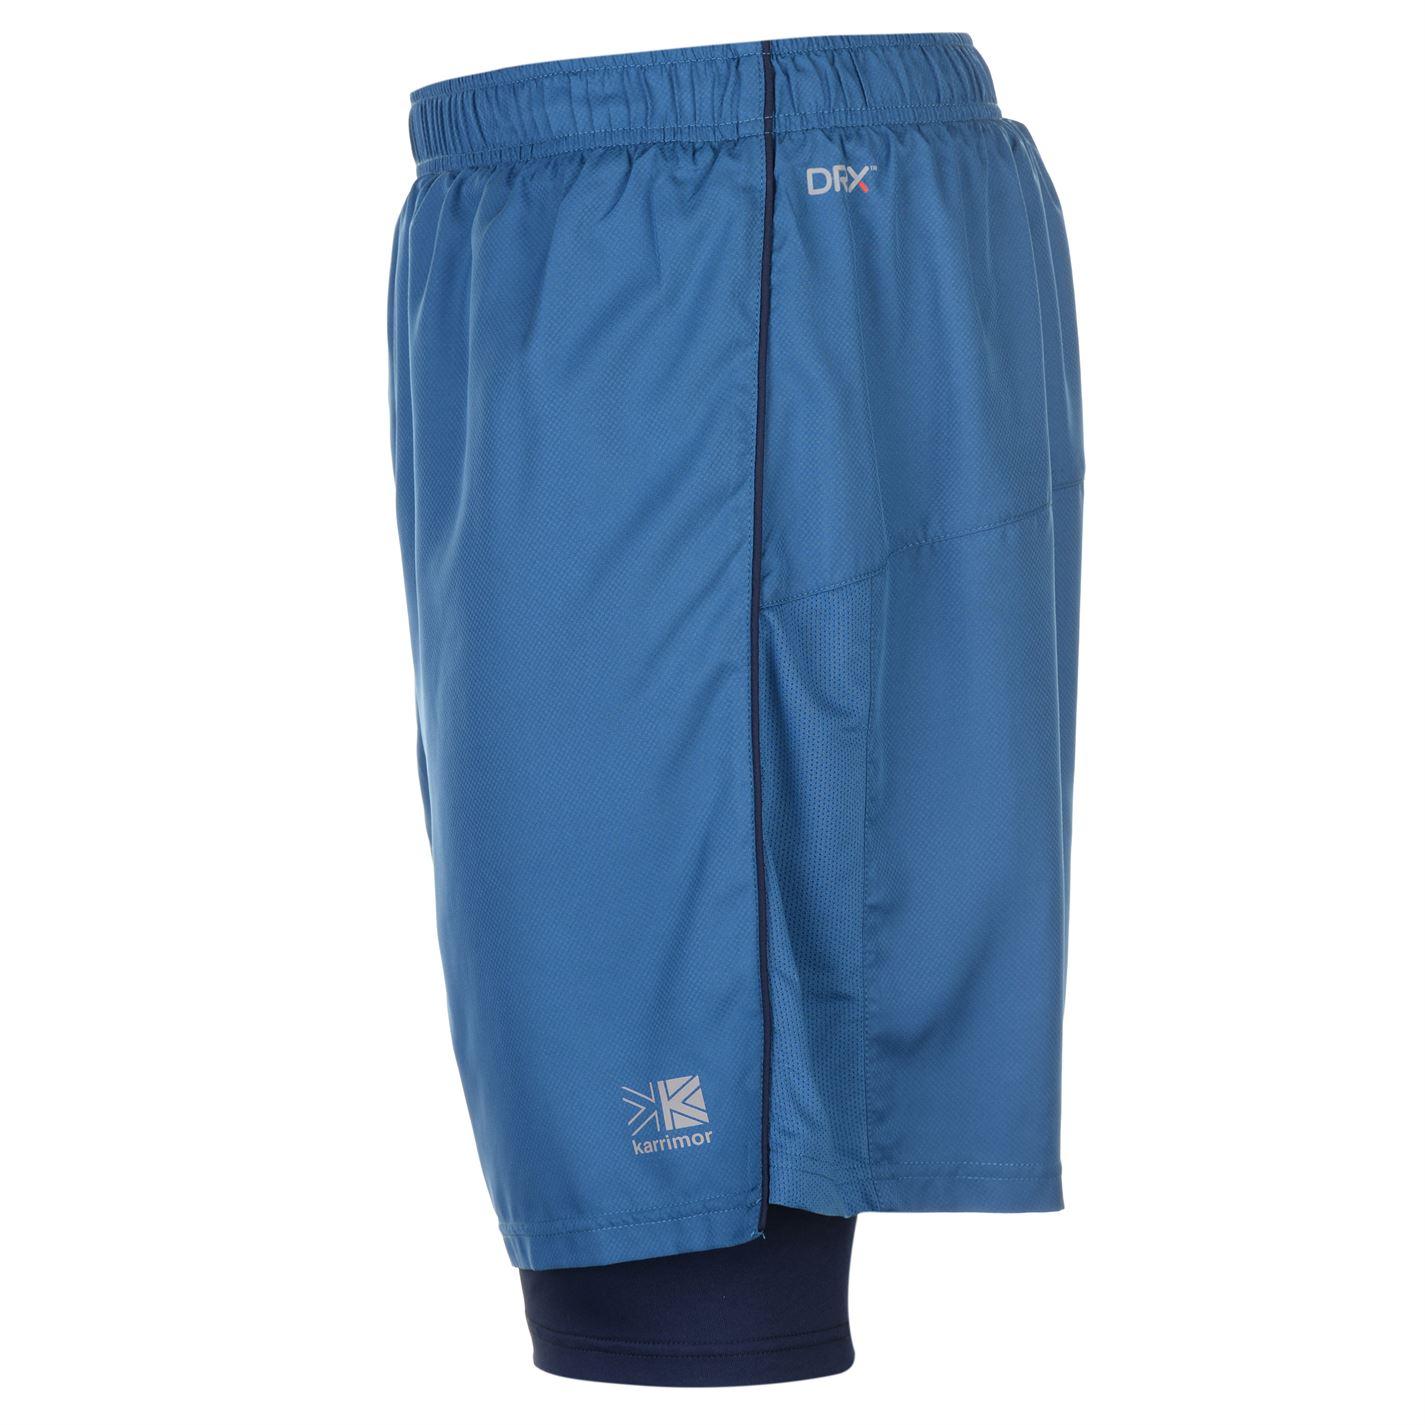 Karrimor-XLite-2in1-Shorts-Performance-Mens thumbnail 17